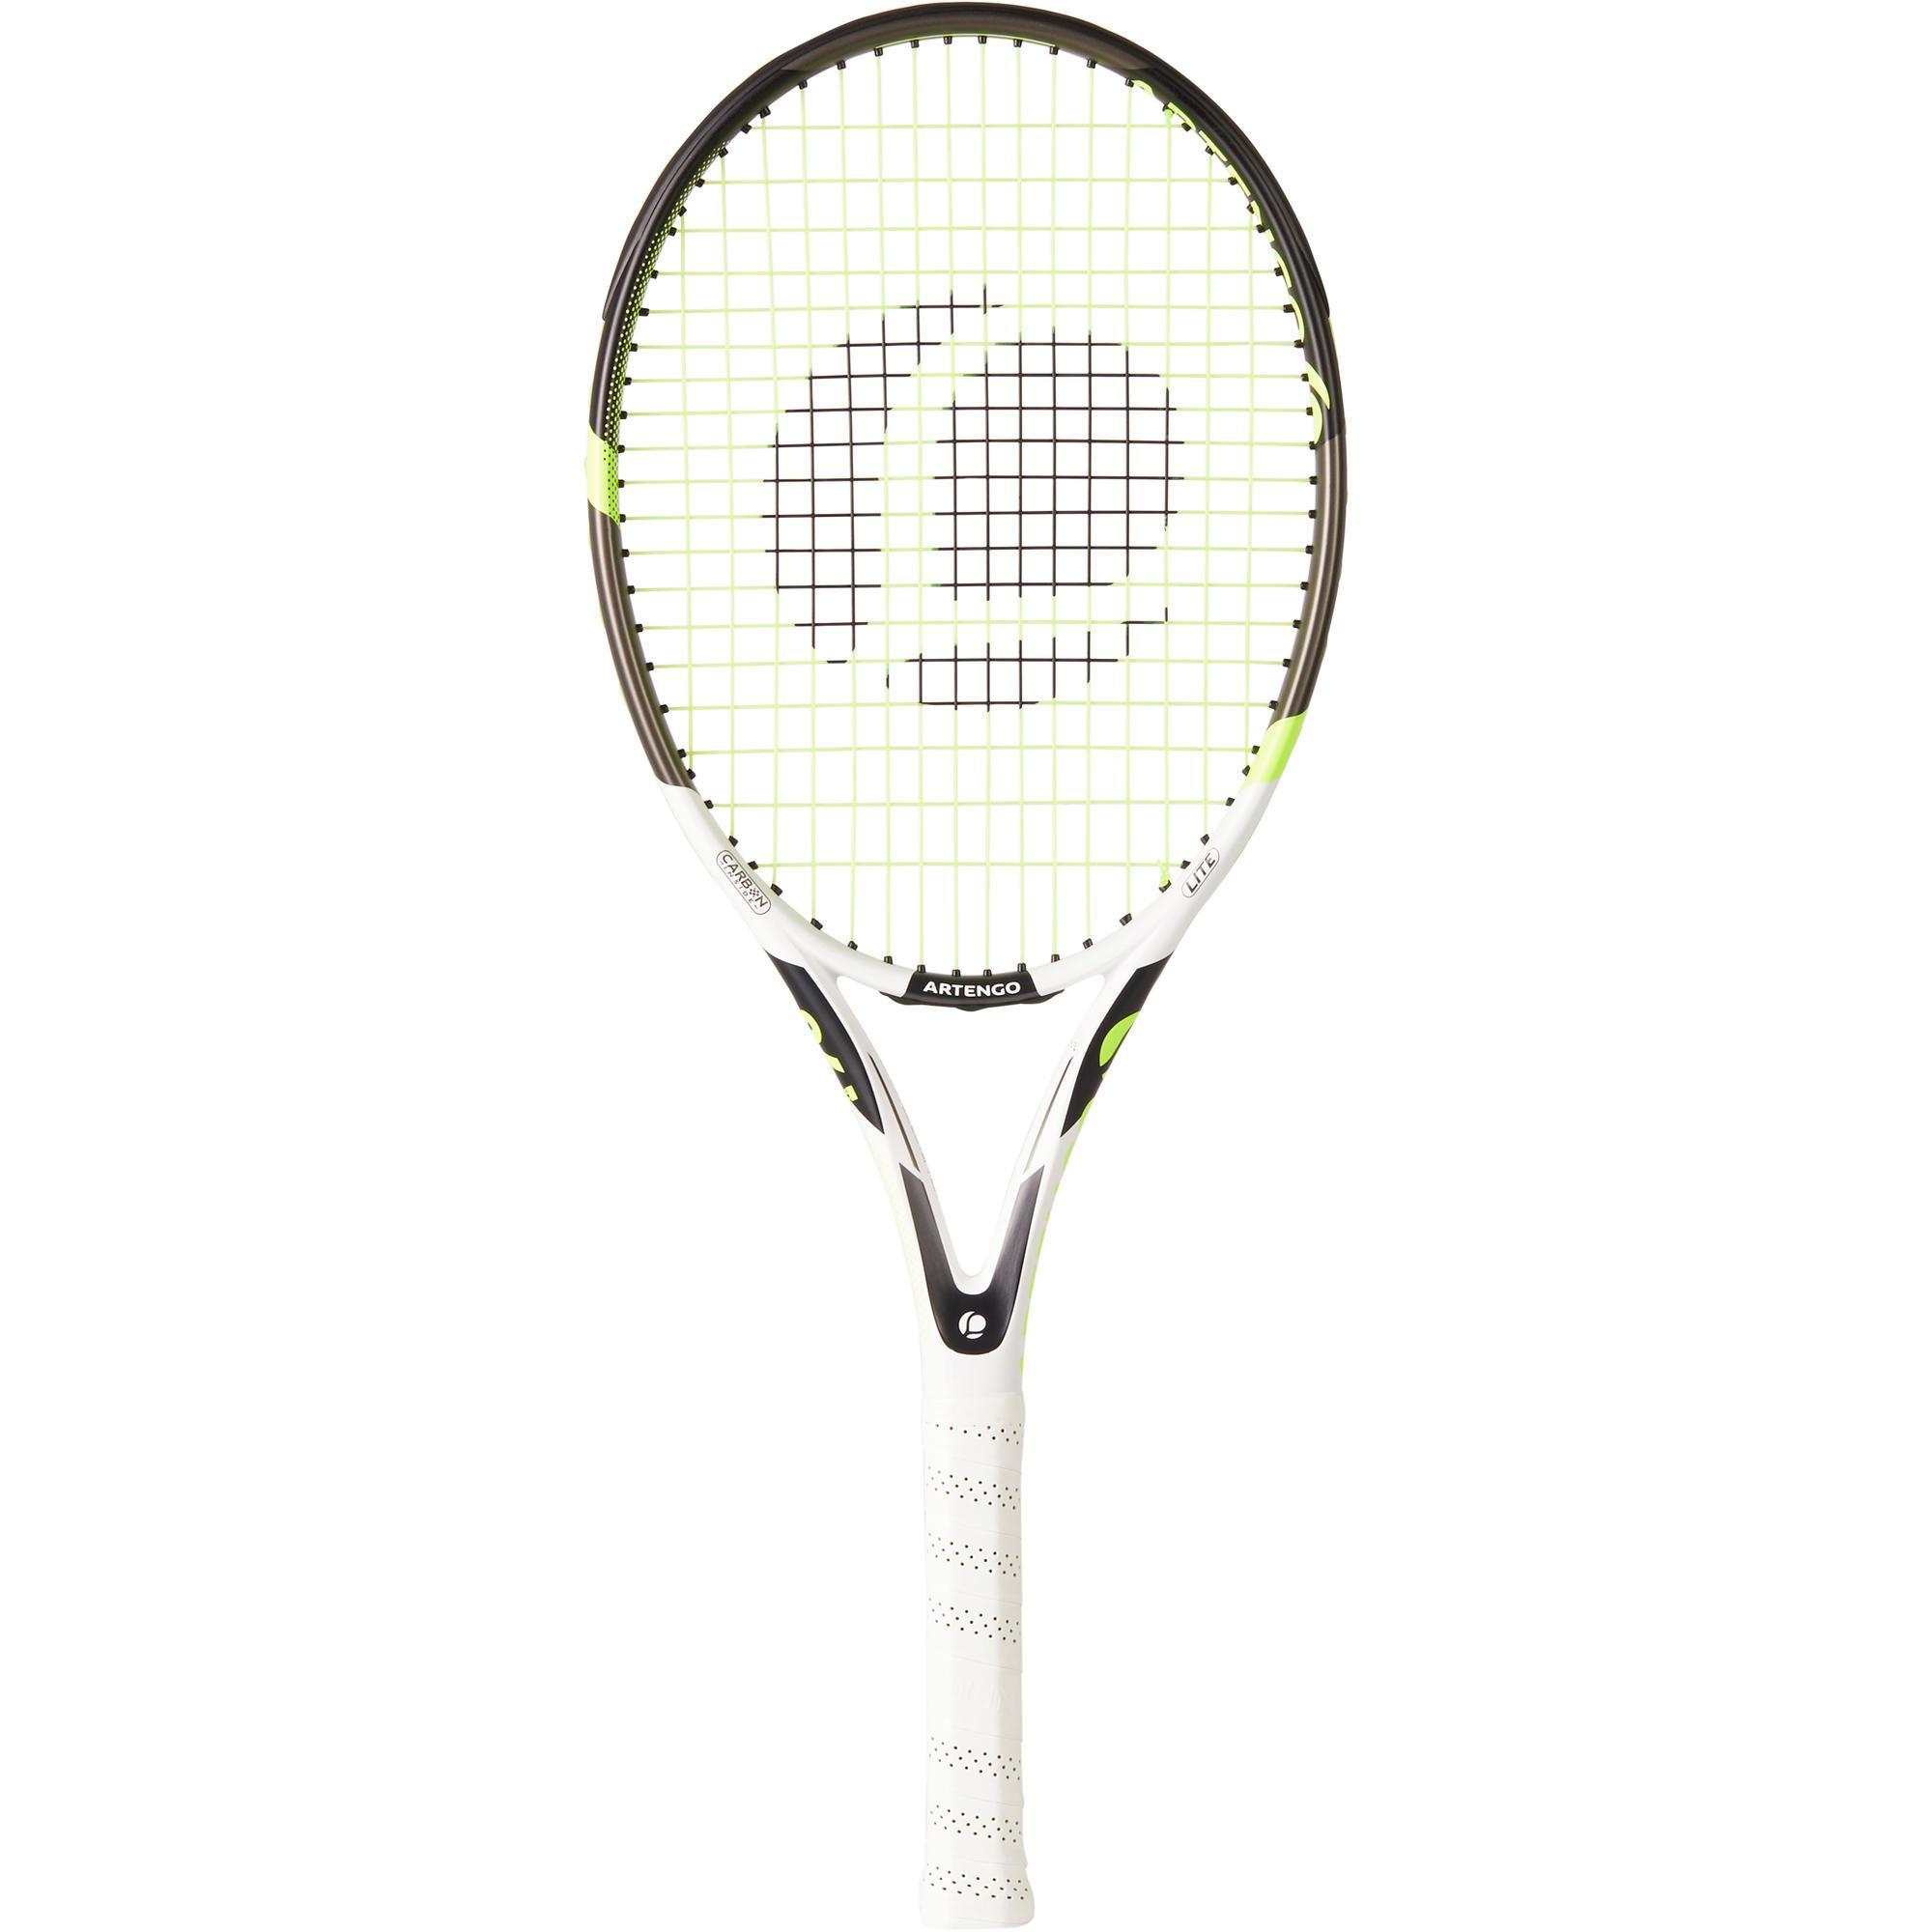 Raquette de tennis adulte tr190 lite blanc artengo